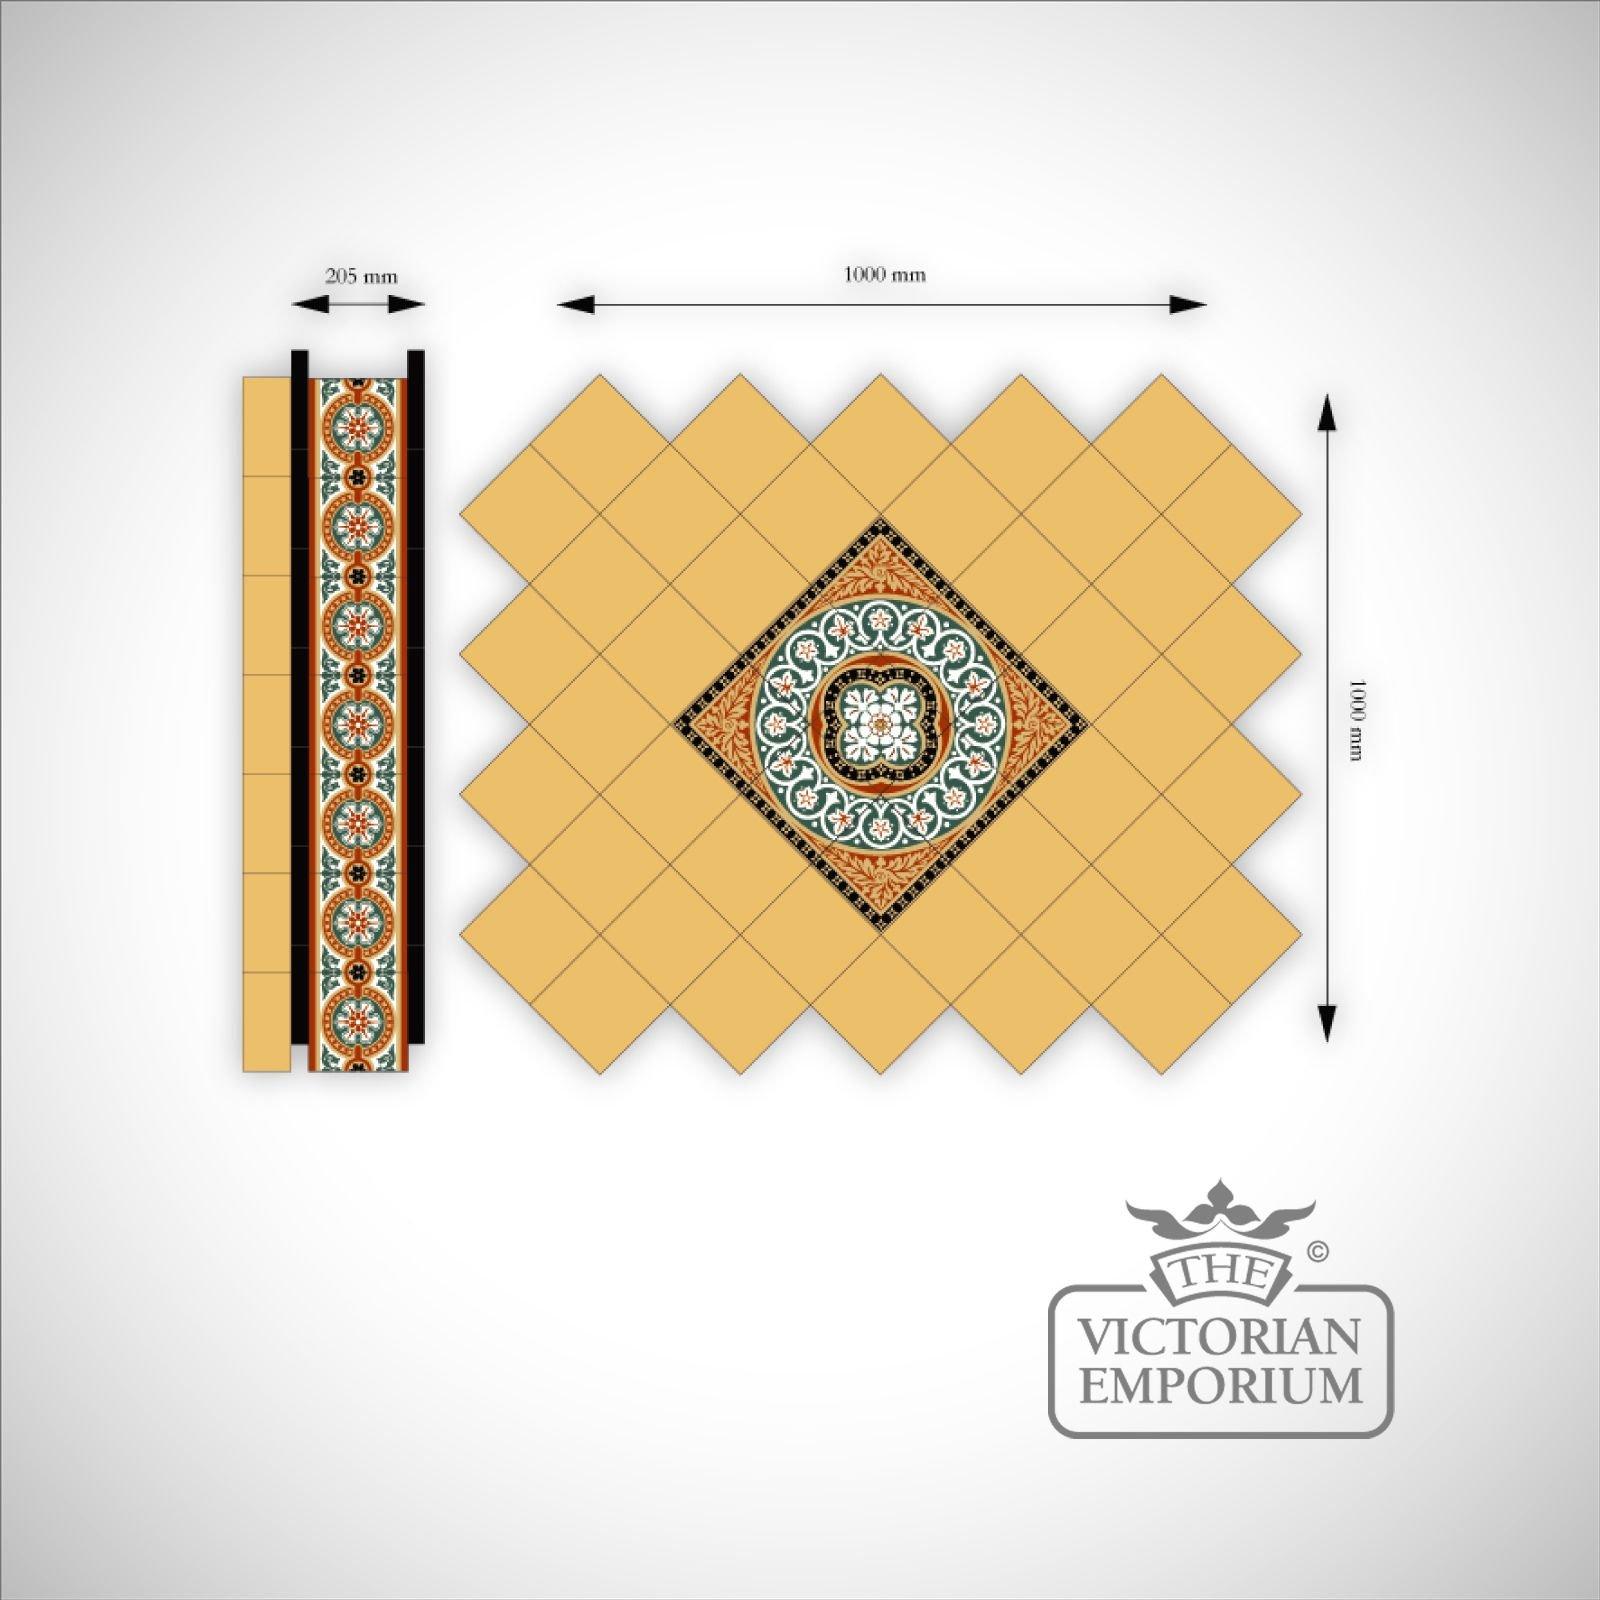 Jacks Field Mosaic Floor tiles Inset (centre) | Victorian Mosaic ...